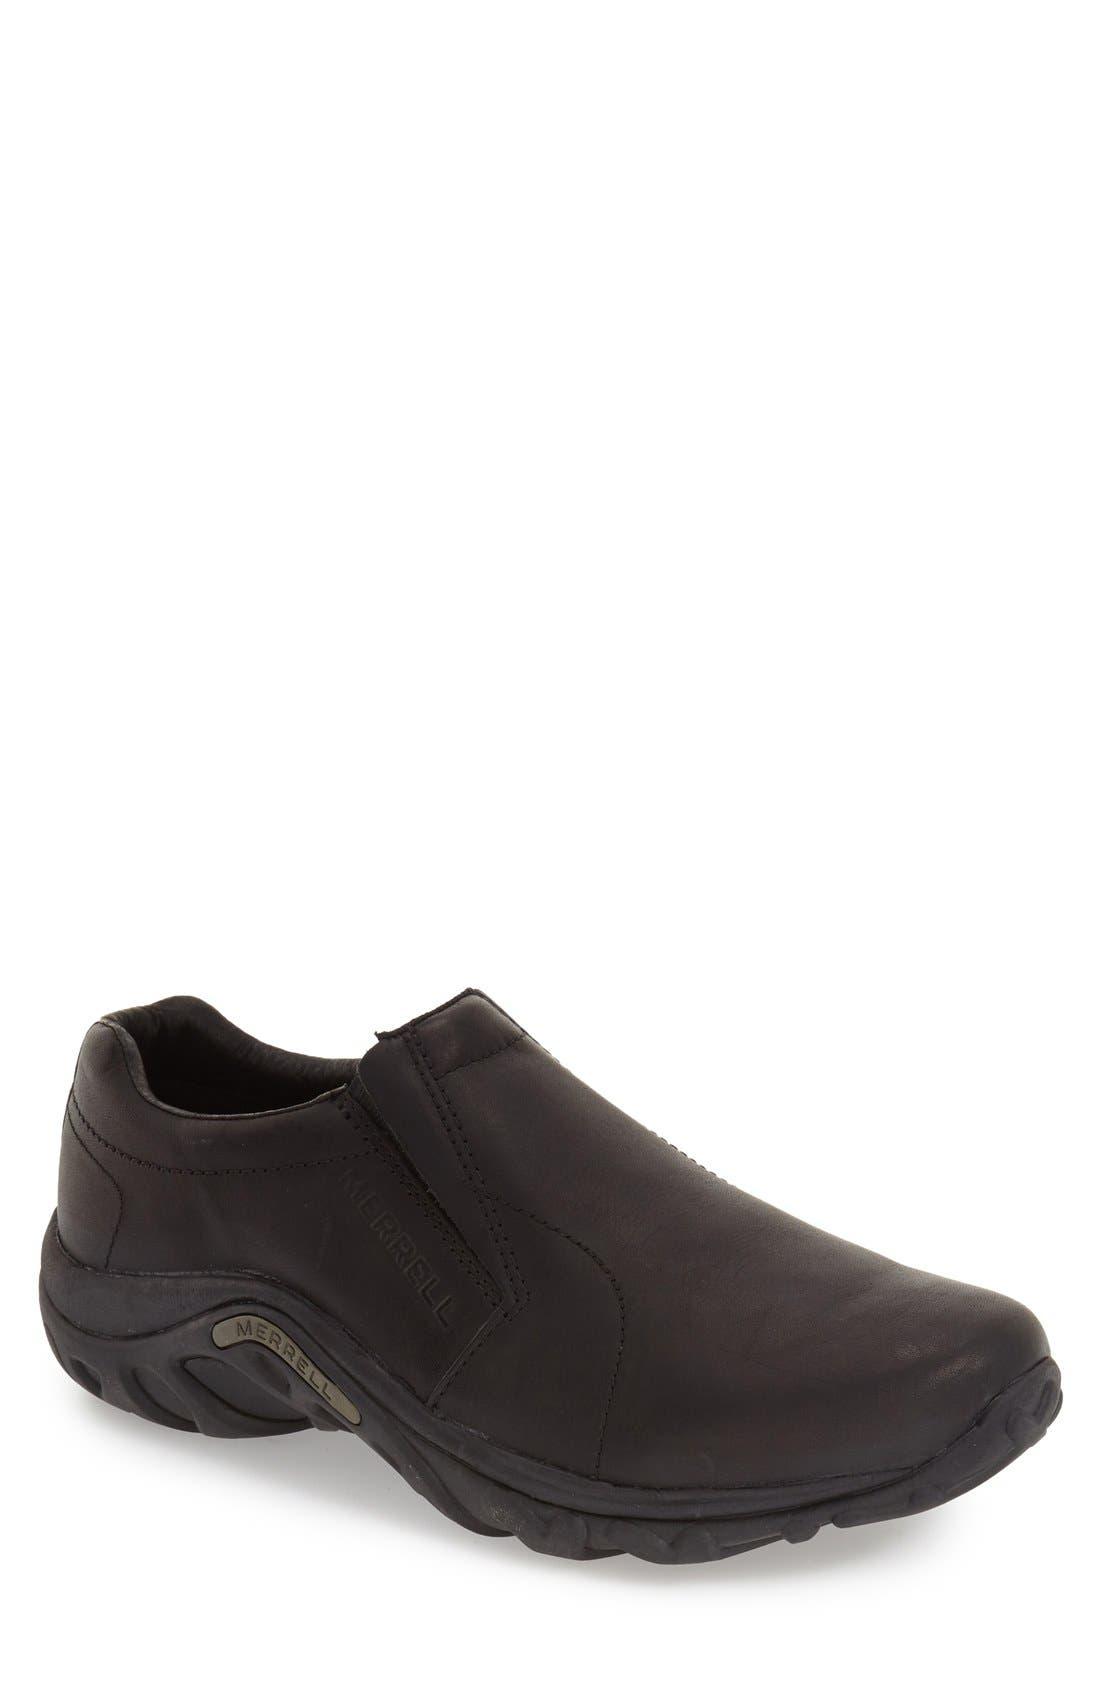 'Jungle Moc' Leather Athletic Slip-On,                             Main thumbnail 1, color,                             BLACK